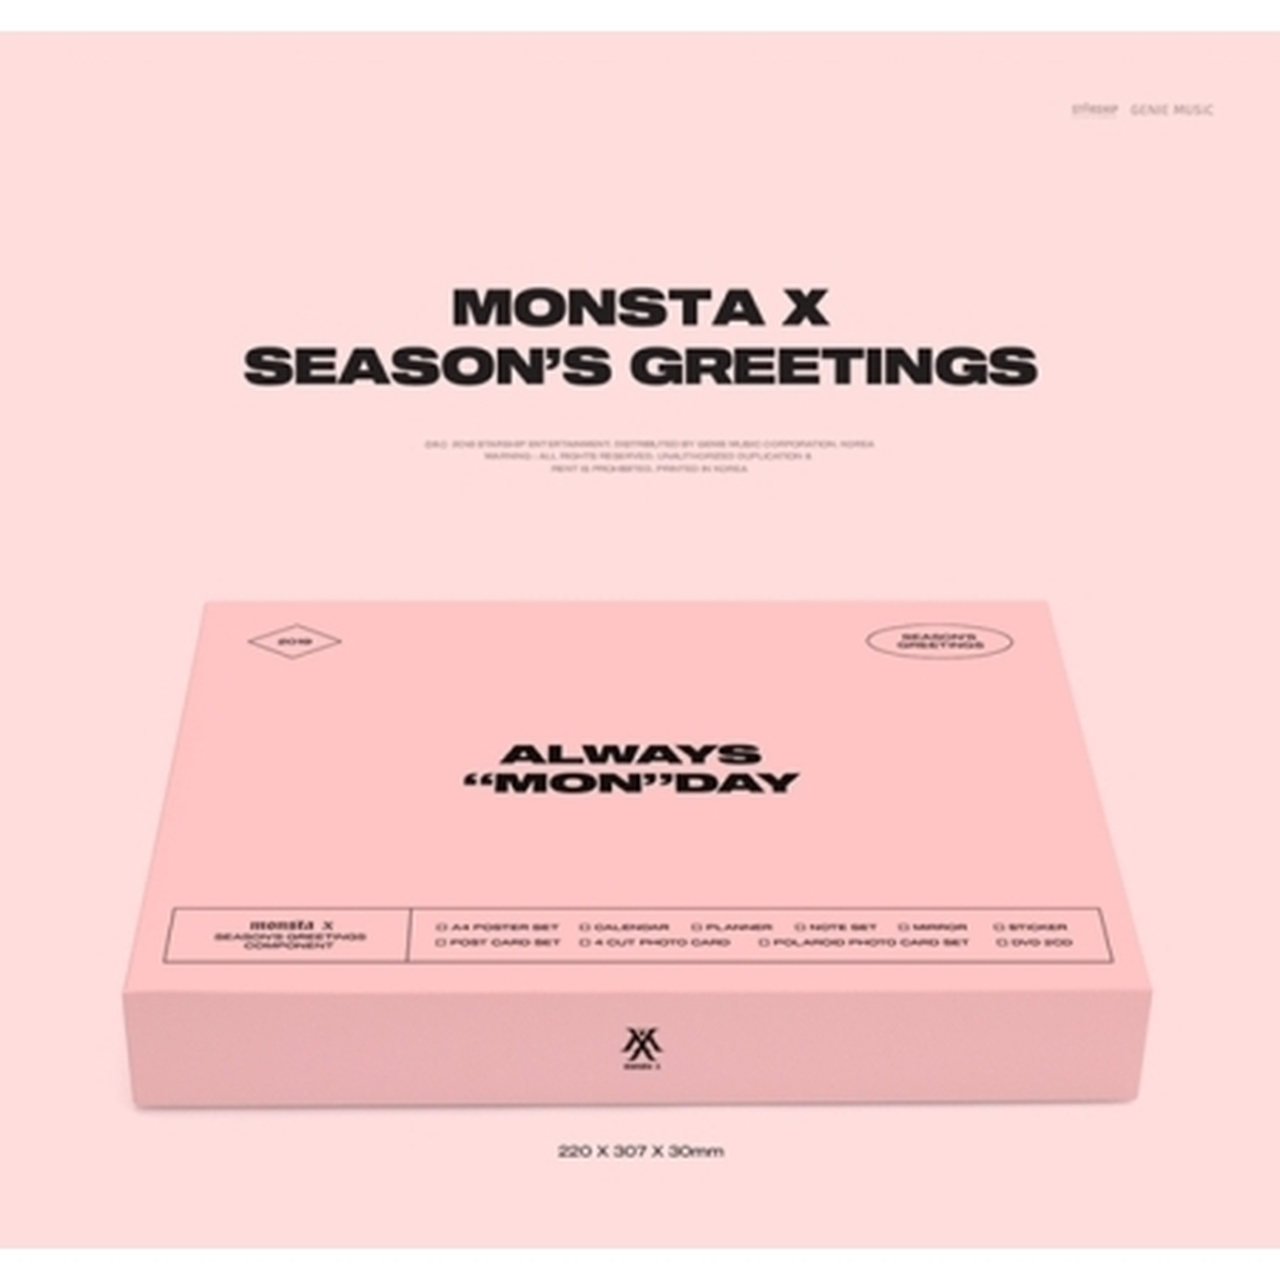 MONSTA X - 2019 SEASON GREETINGS